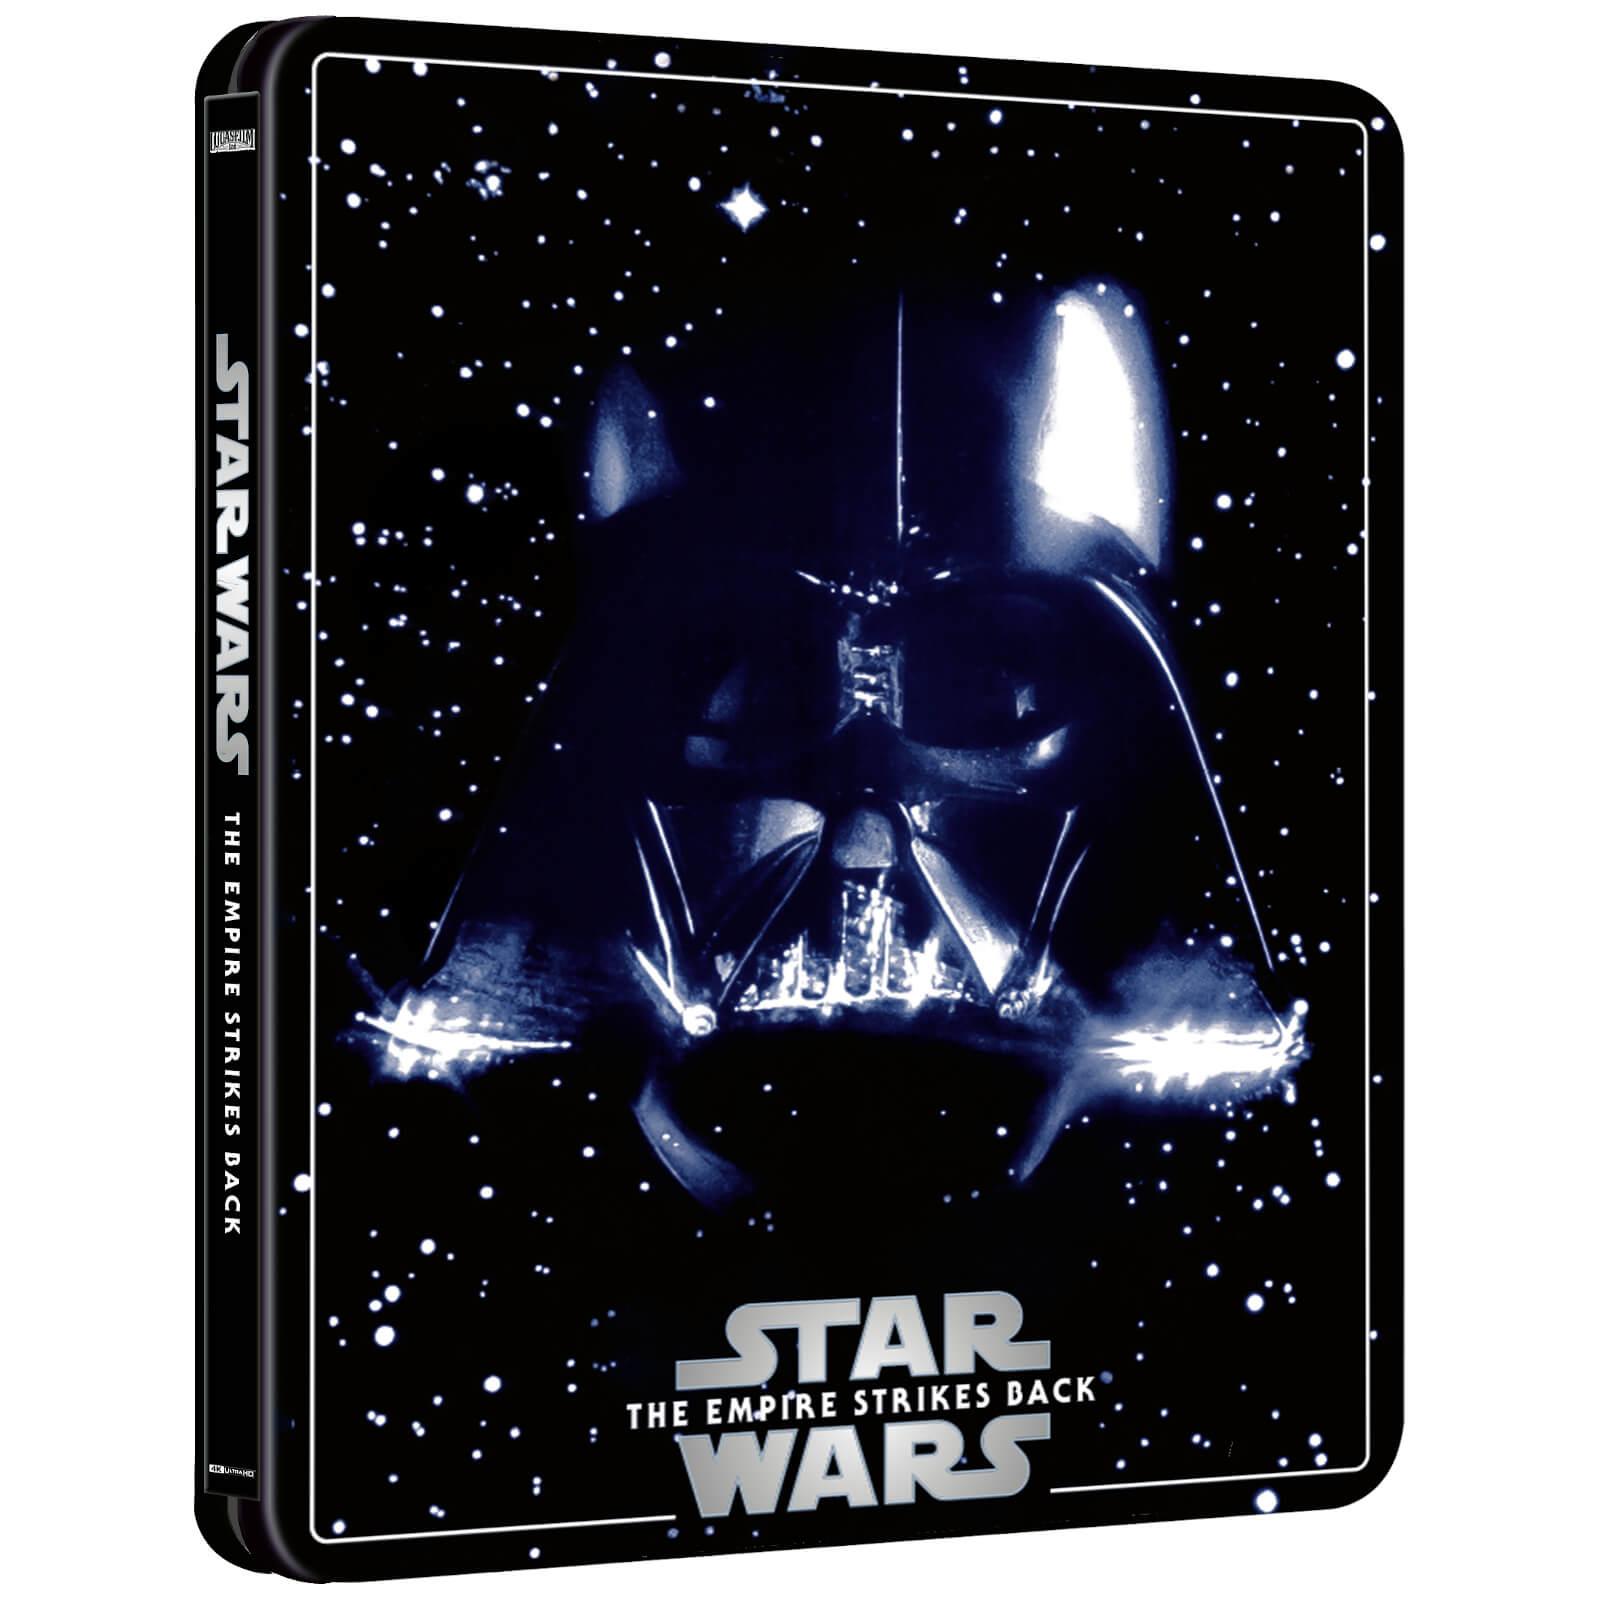 Star Wars: The Empire Strikes Back (Zavvi Steelbook)